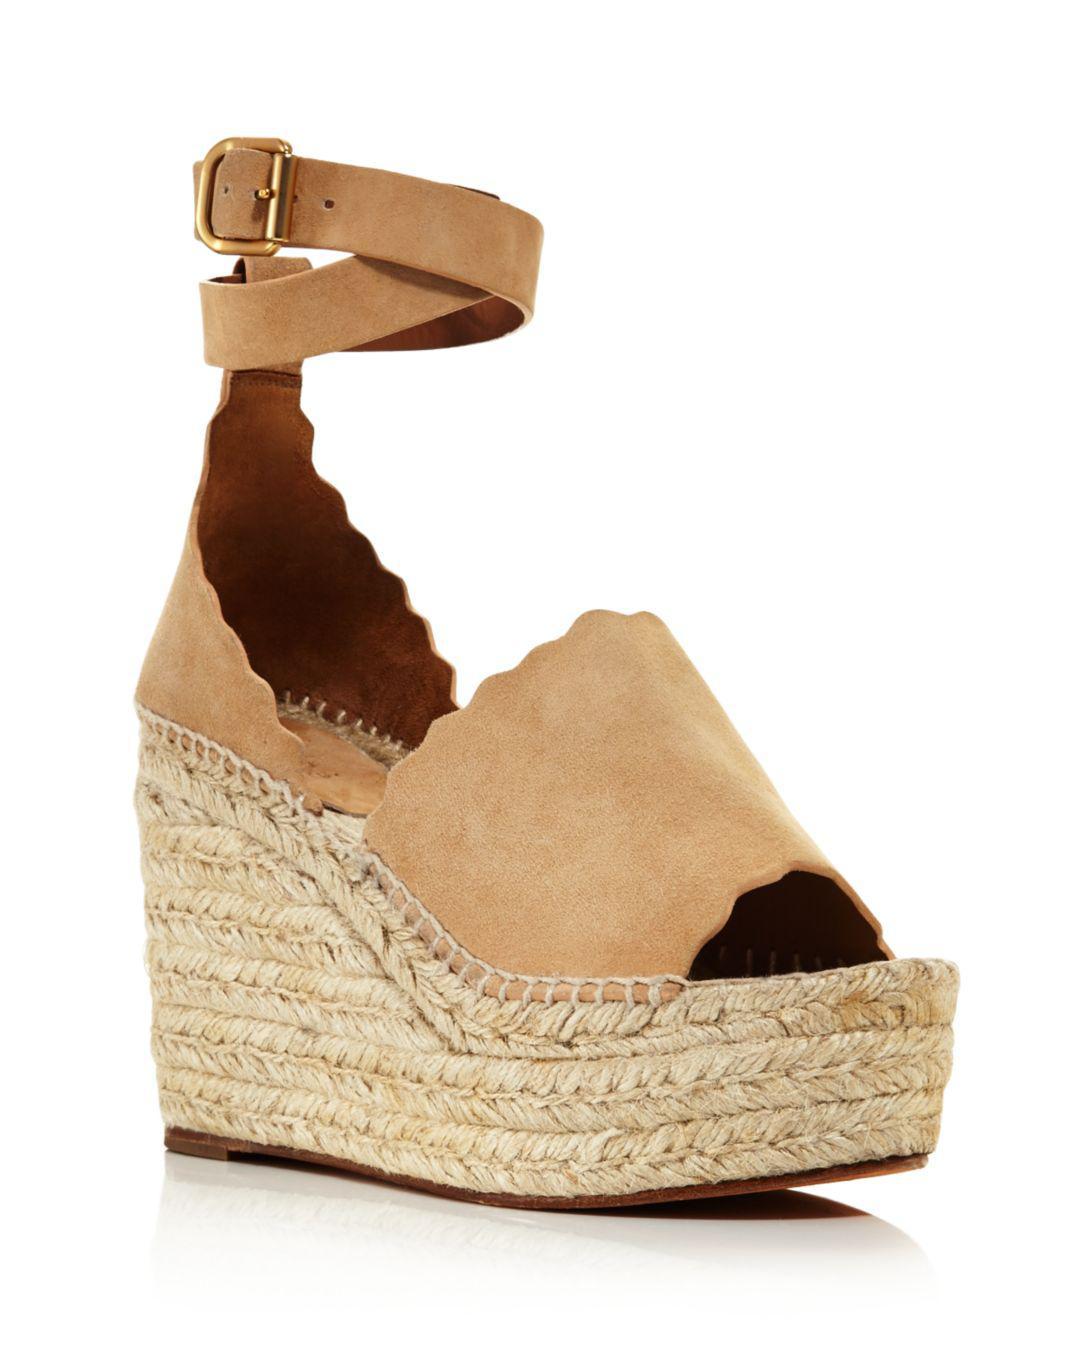 394a0407fd8 Chloé Women s Lauren Espadrille Platform Wedge Sandals - Lyst